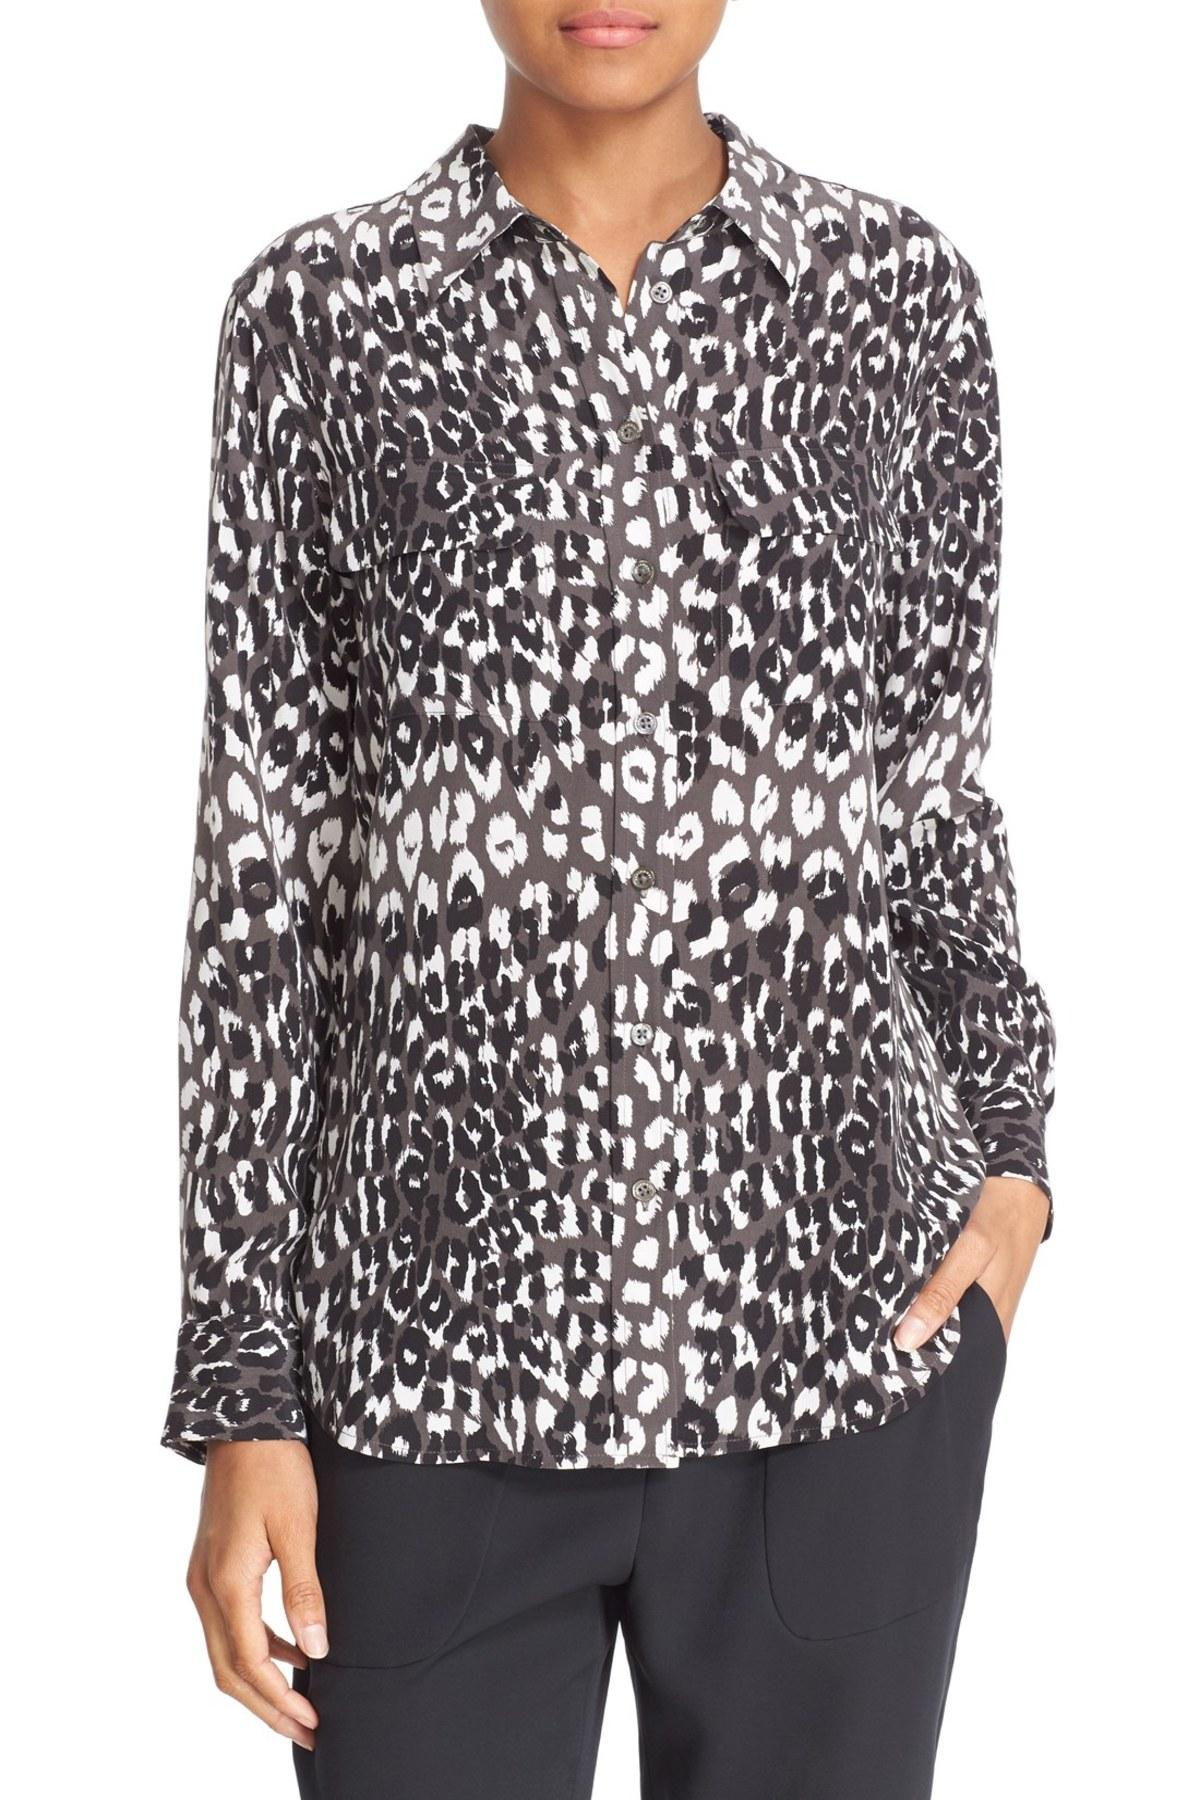 Lyst equipment slim signature cheetah print silk shirt for Equipment black silk shirt